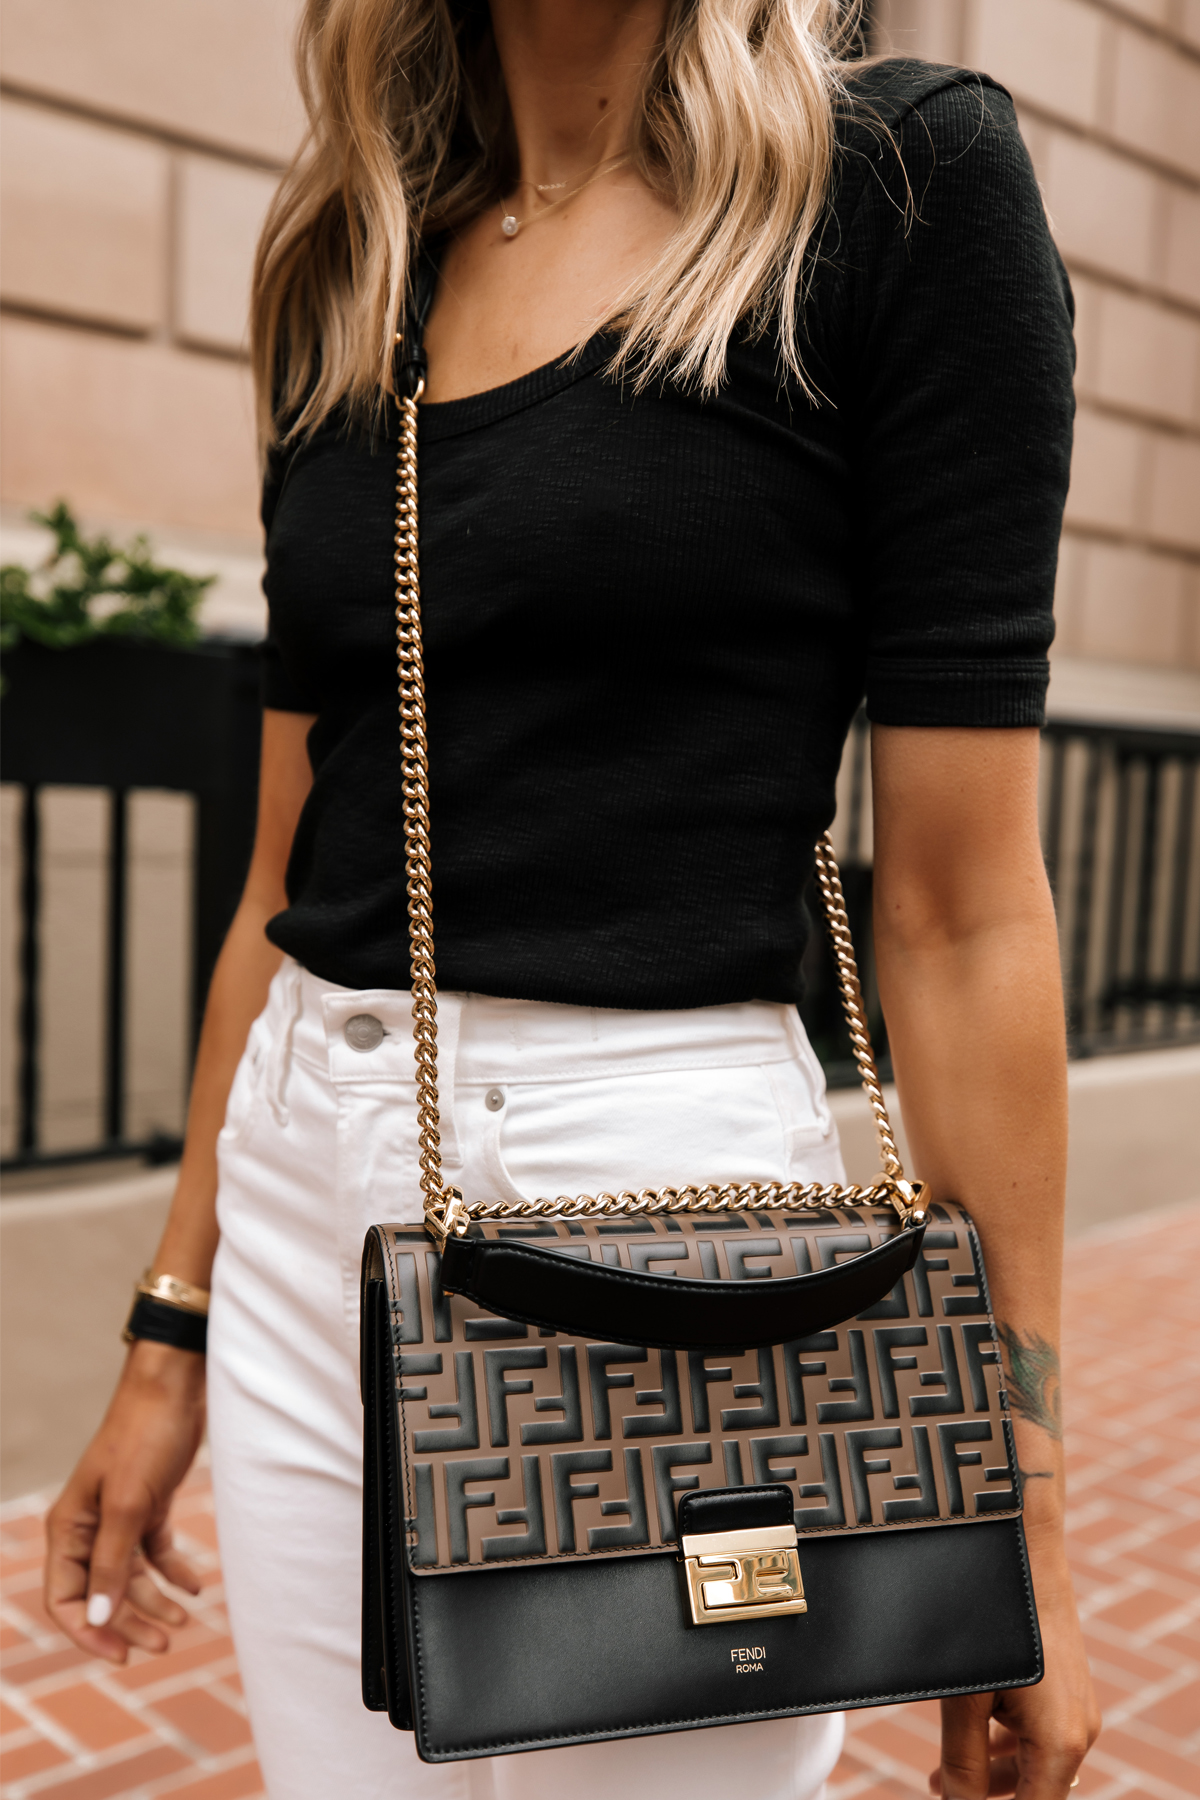 Fashion Jackson Wearing Black Scoop Neck Top White Jeans Fendi Ken U Medium Shoulder Bag 2